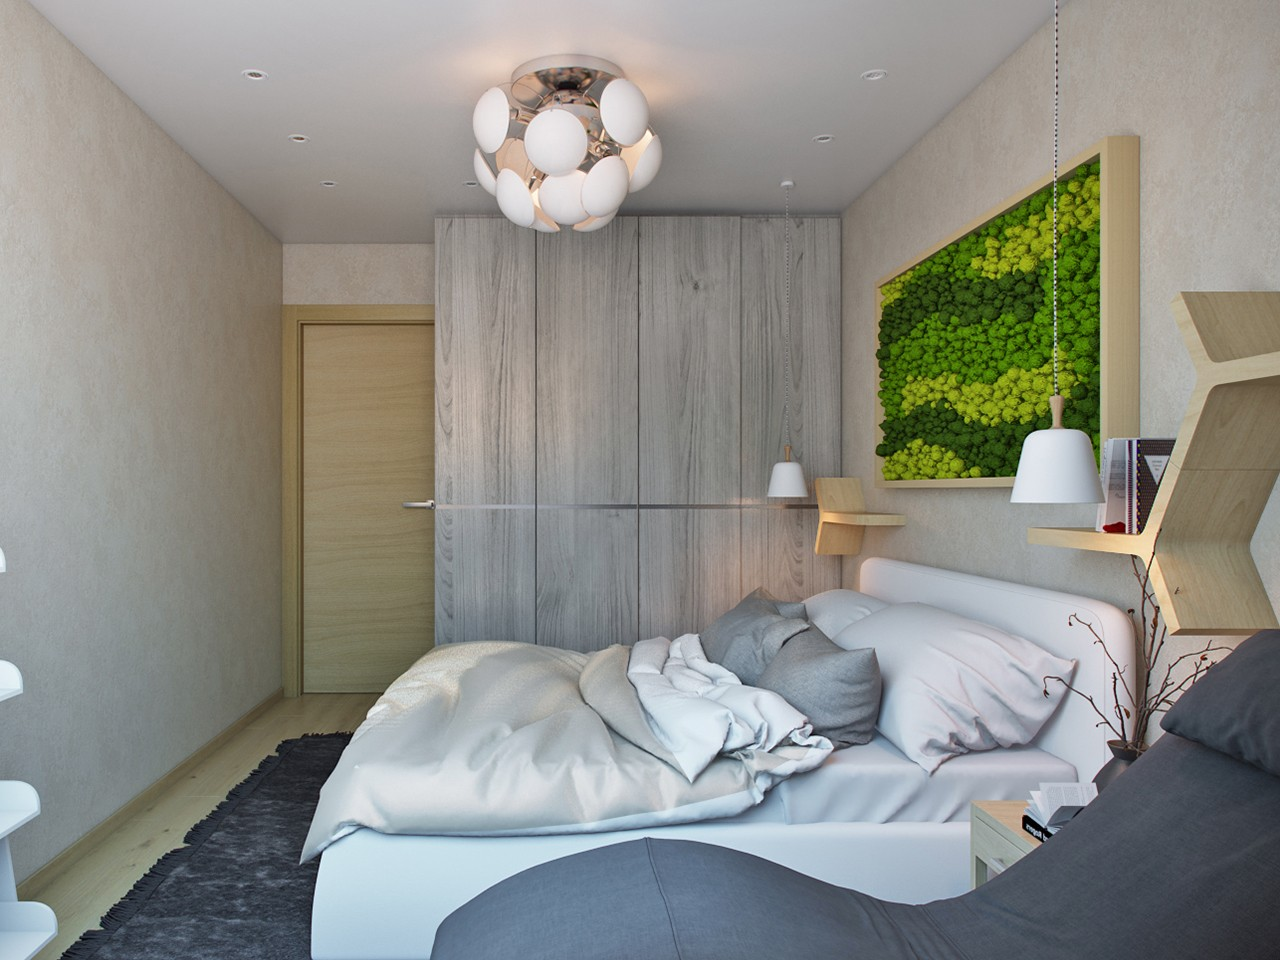 спальня в эко стиле фото